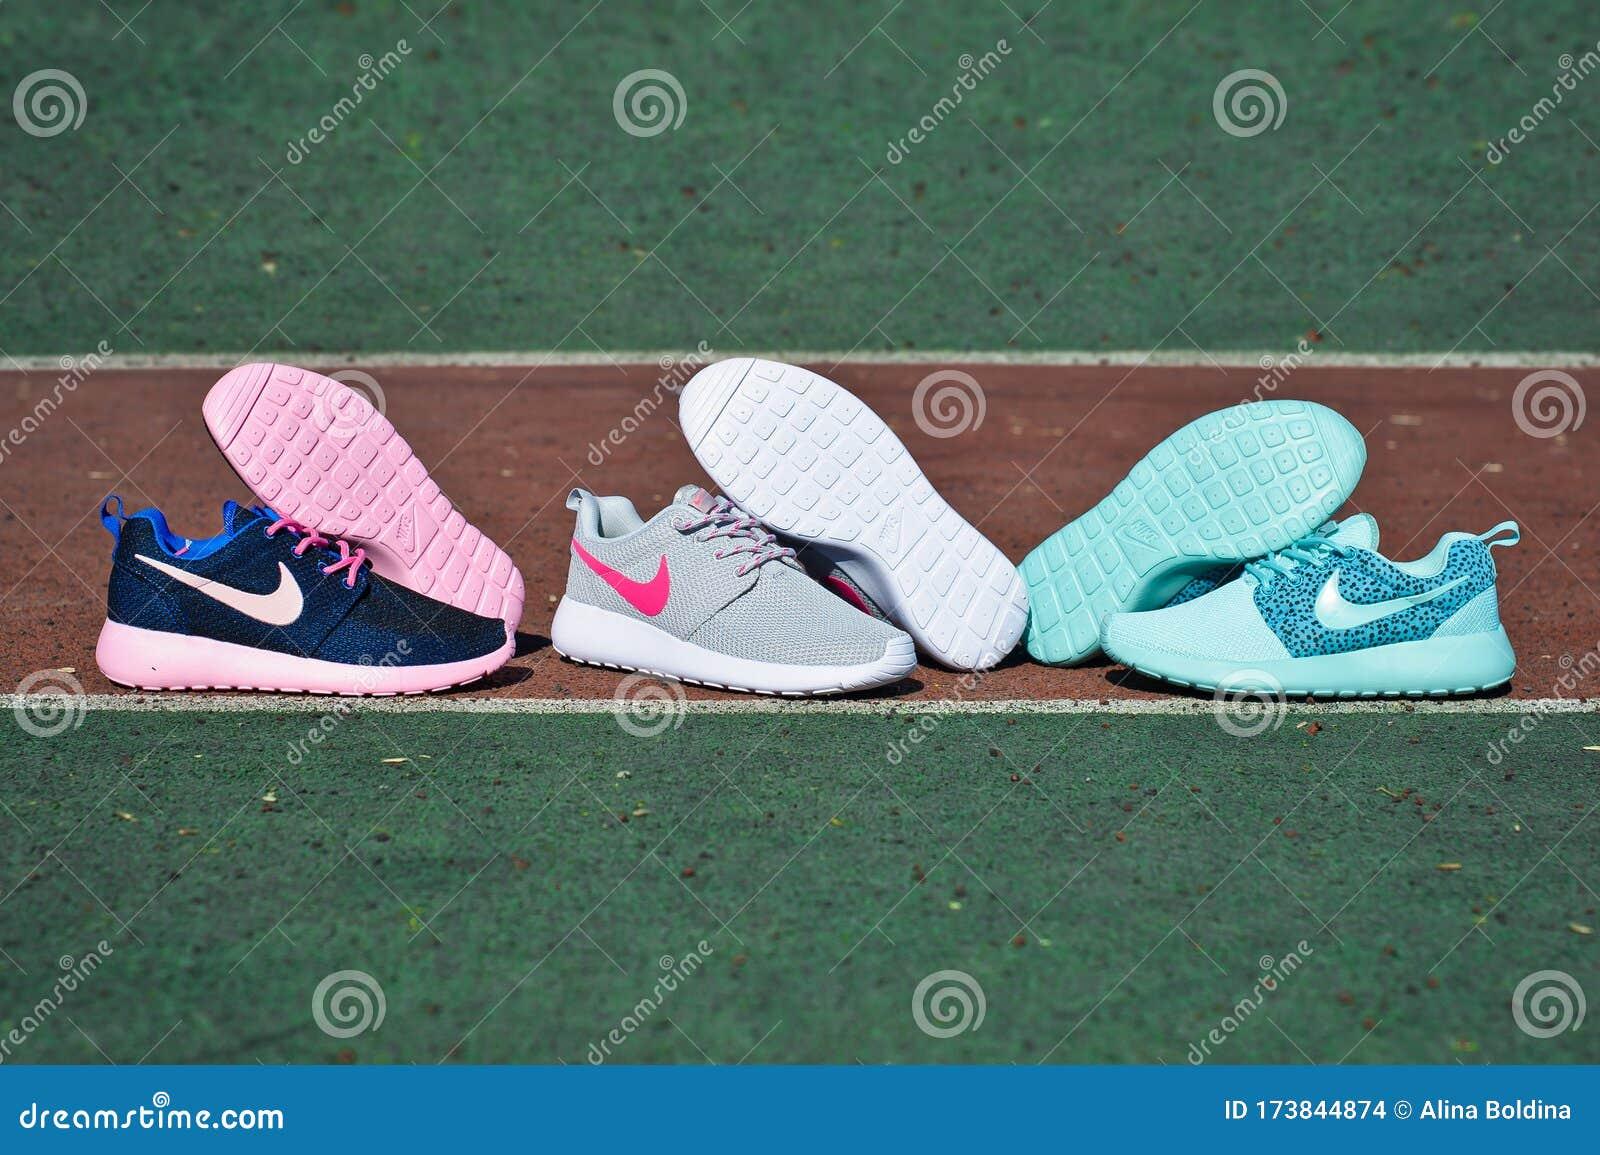 Nike Roshe Run Sneakers, Running Shoes